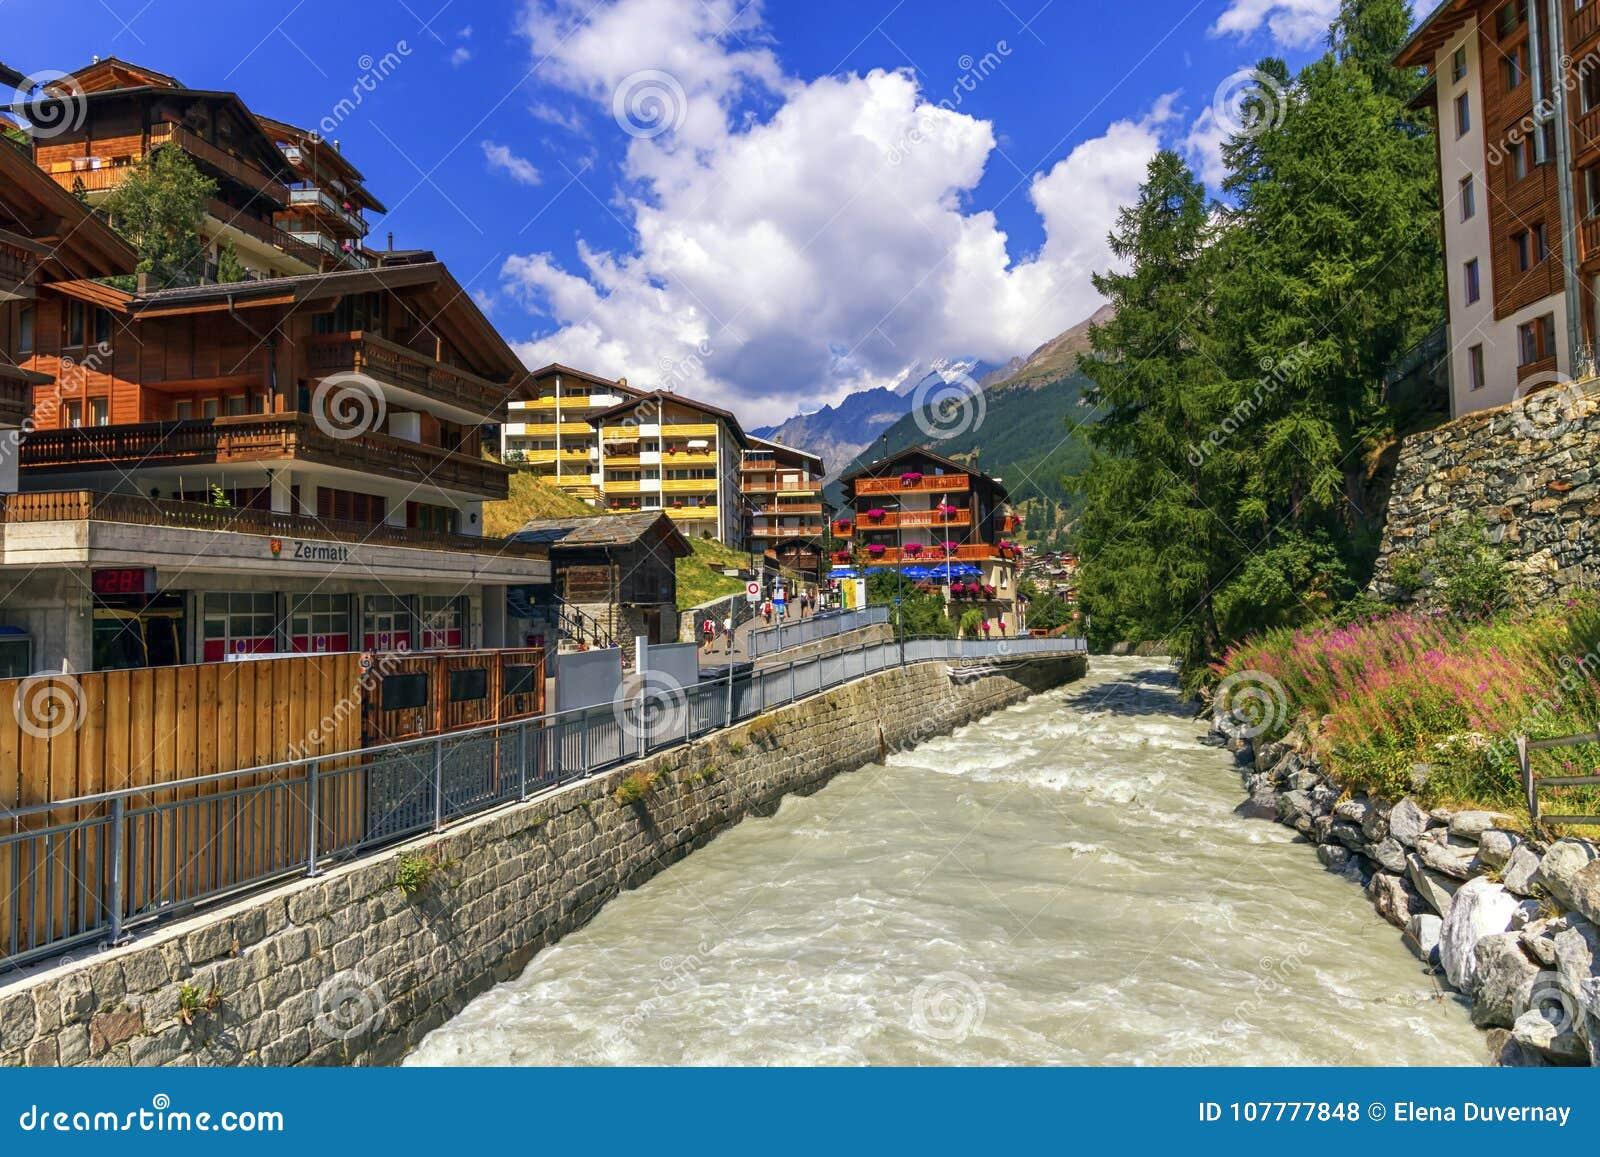 Matter Vispa river in Zermatt, Switzerland